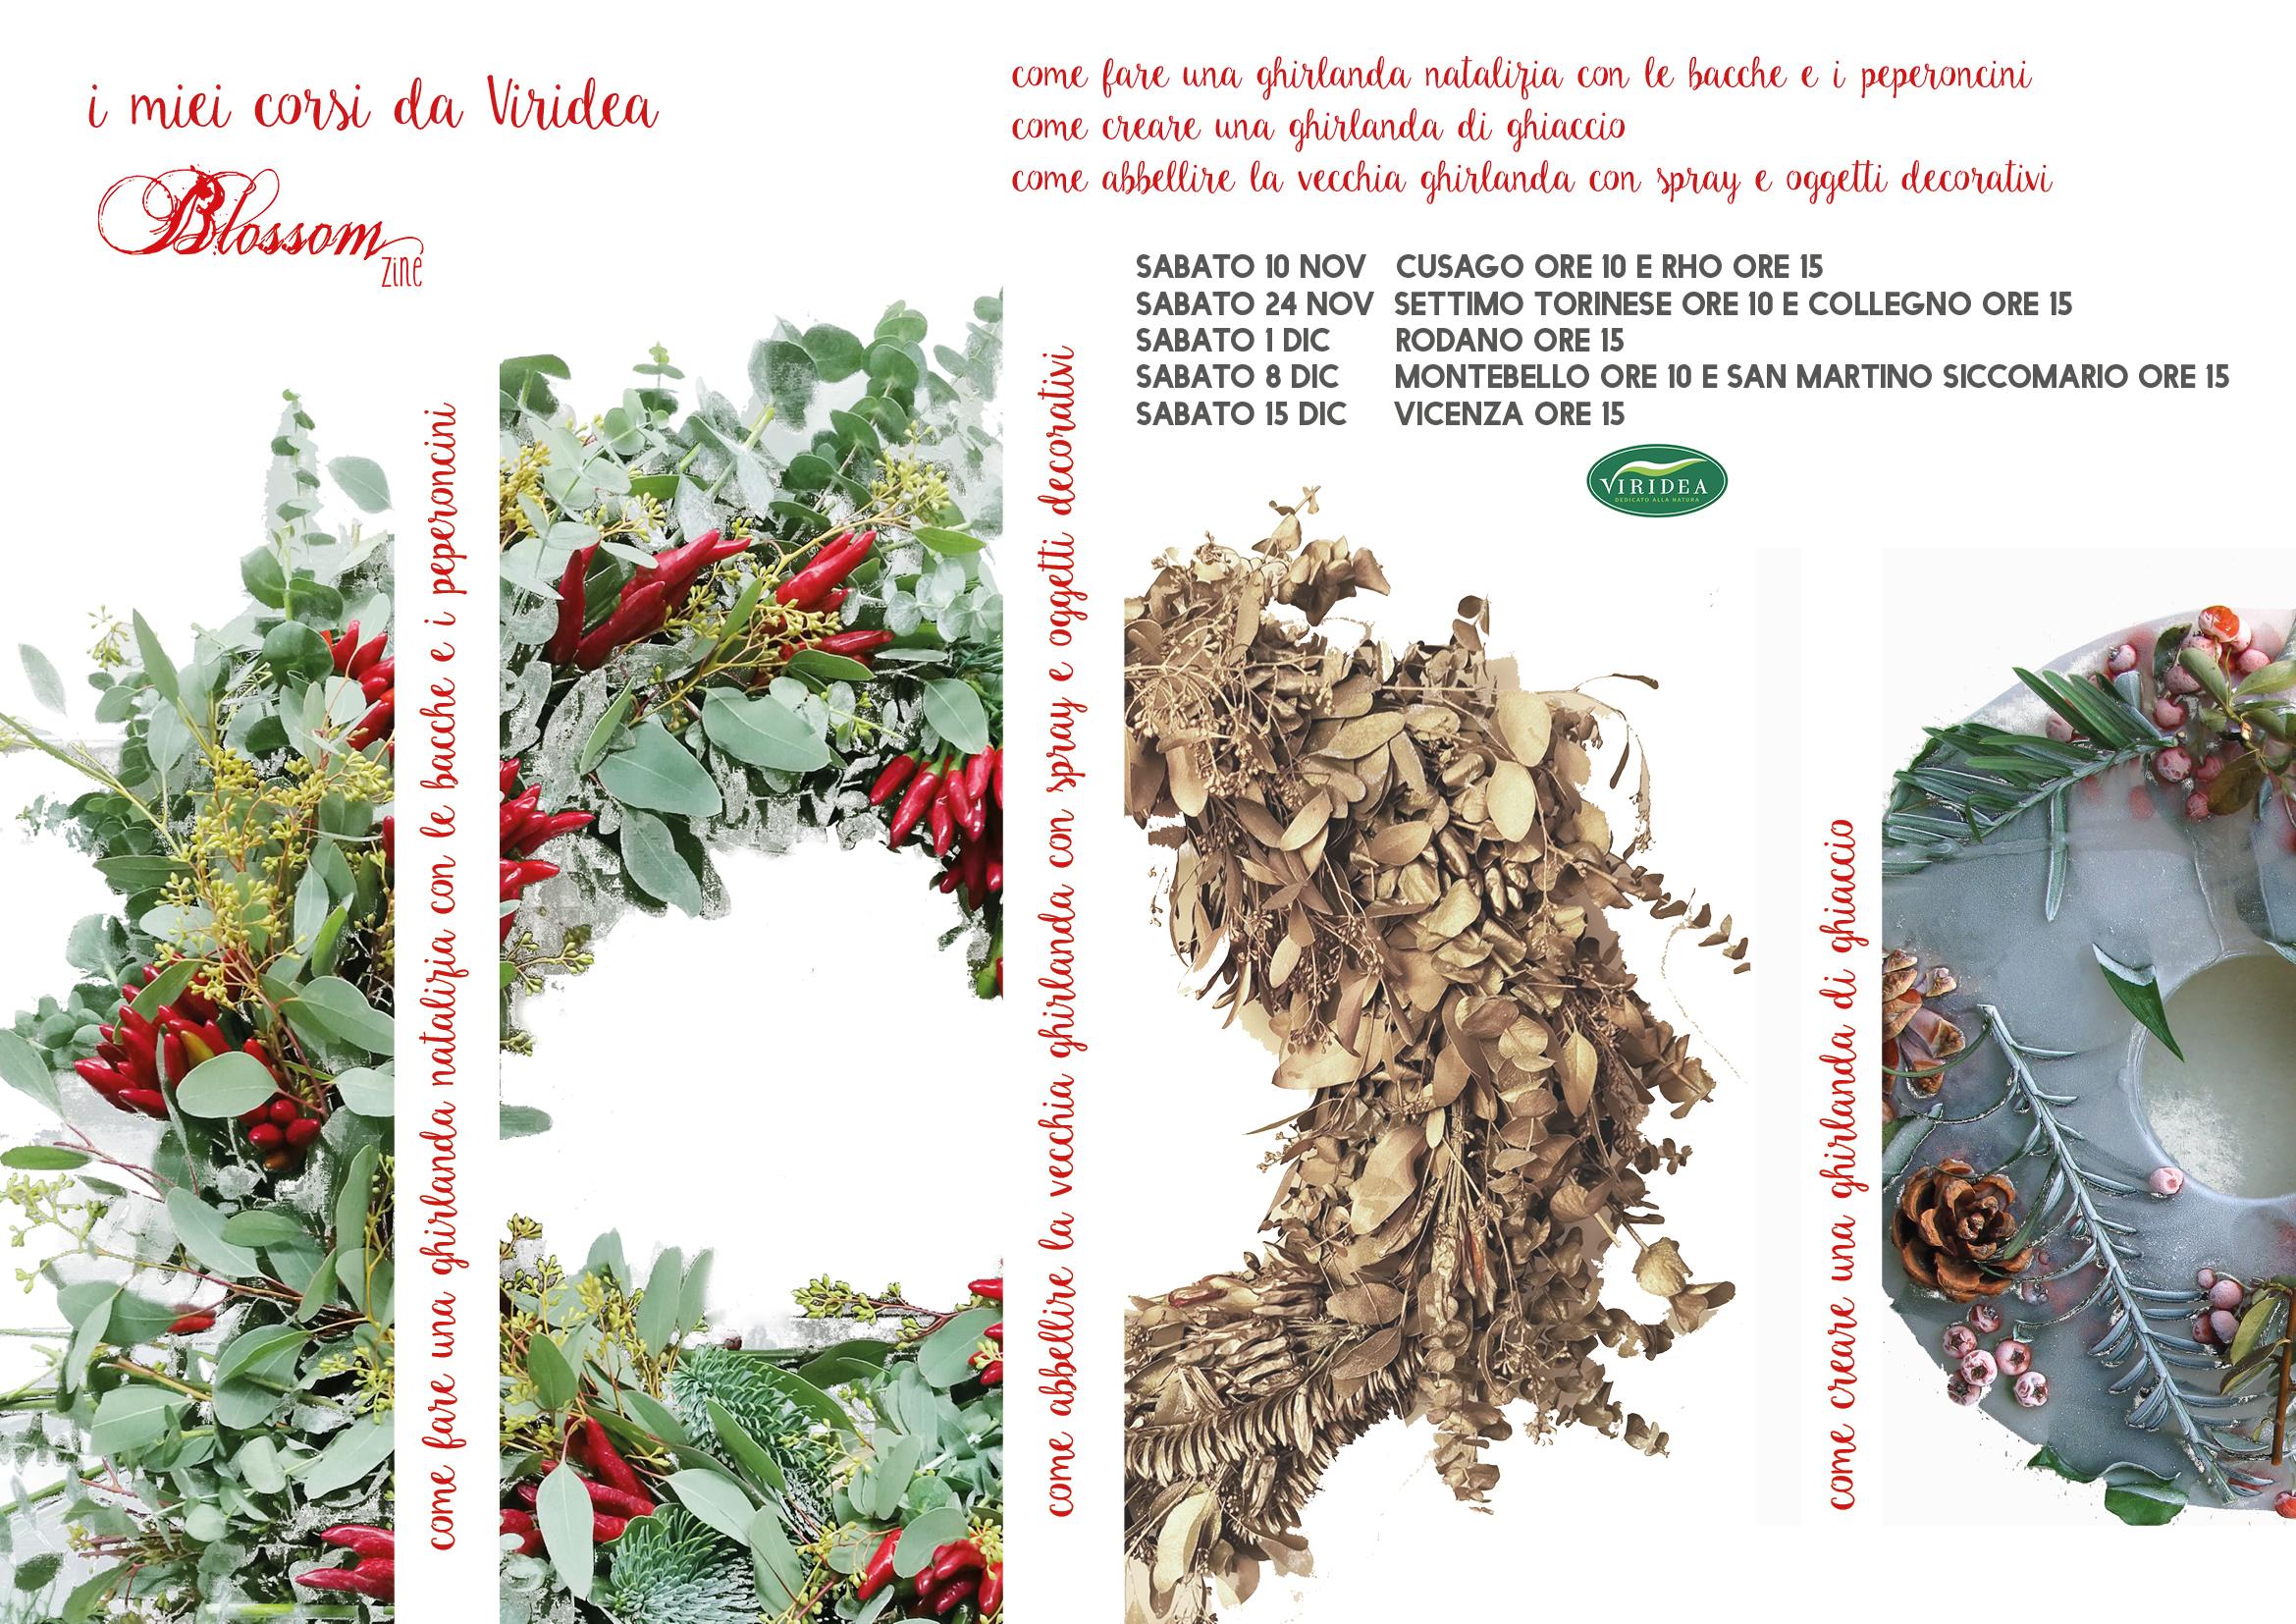 Workshop Natalizi Da Viridea Ghirlande Per Tutte Le Tasche